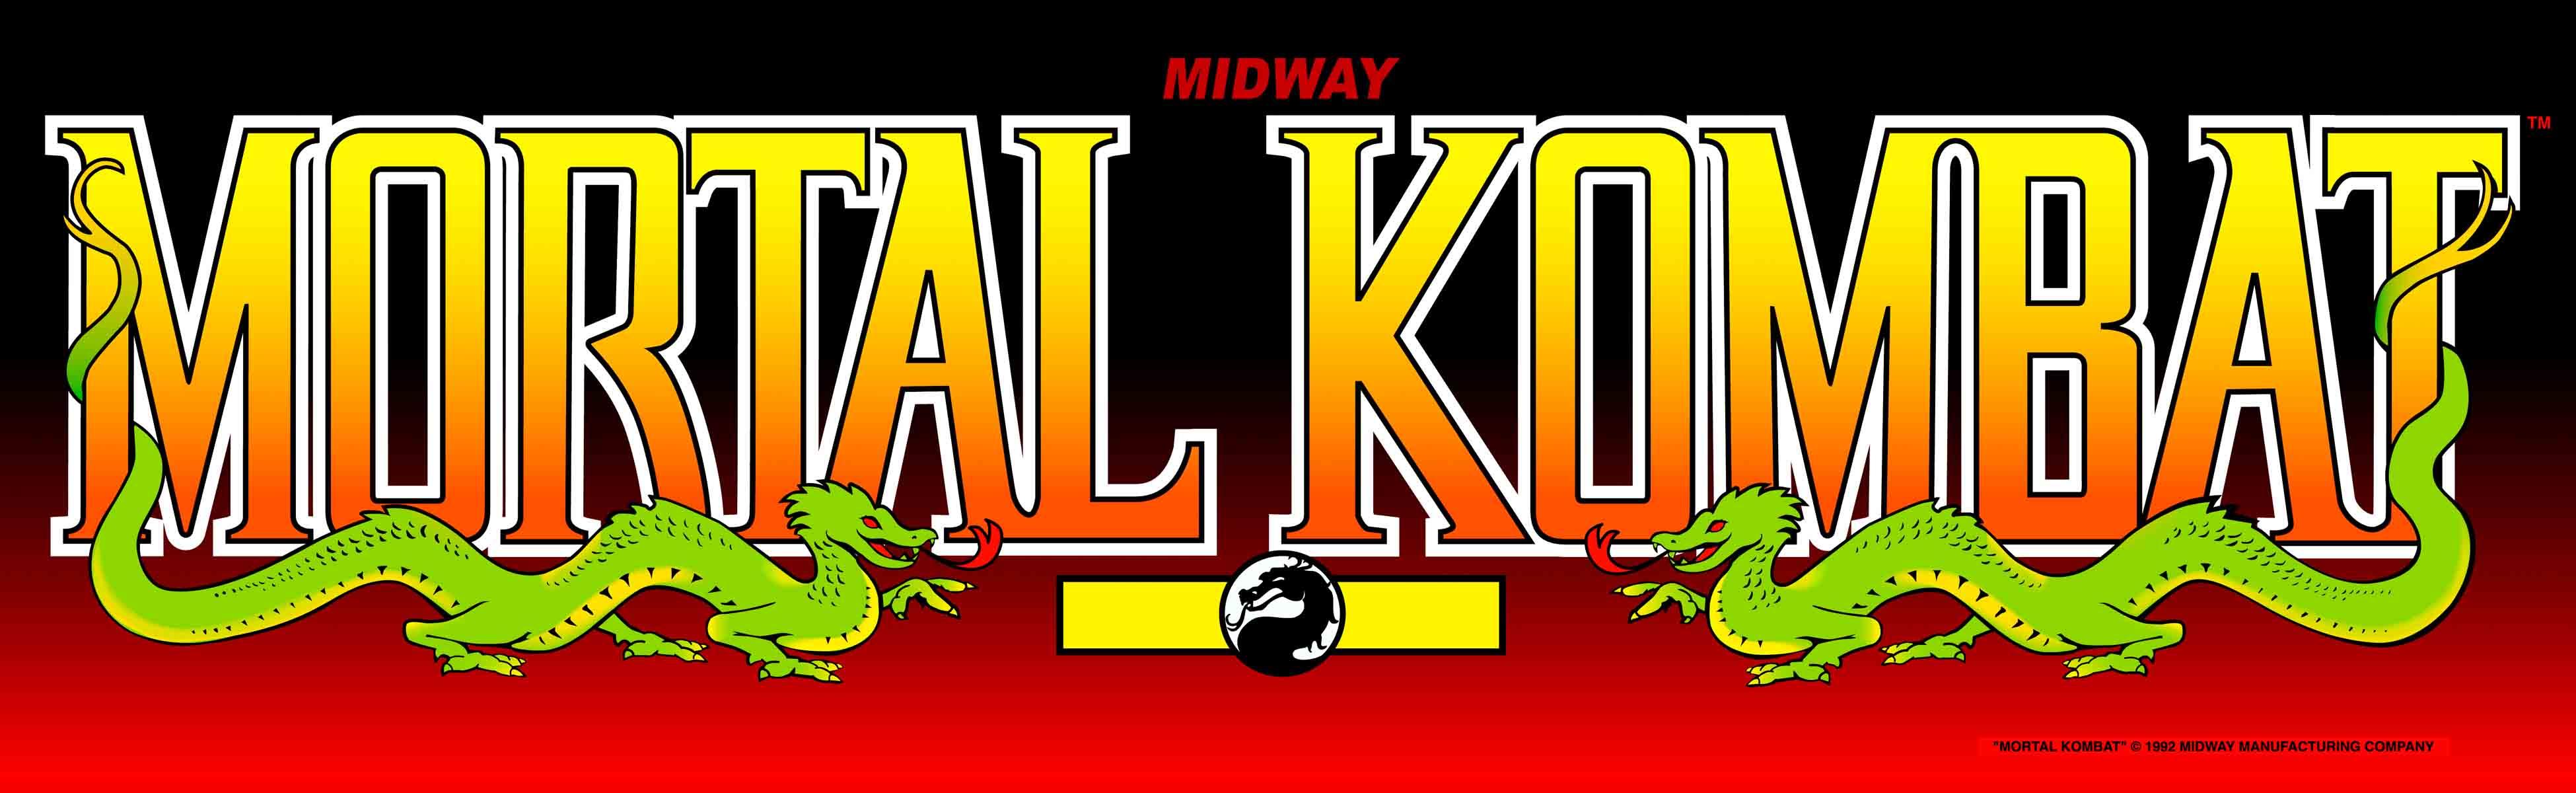 A World of Games: Mortal Kombat